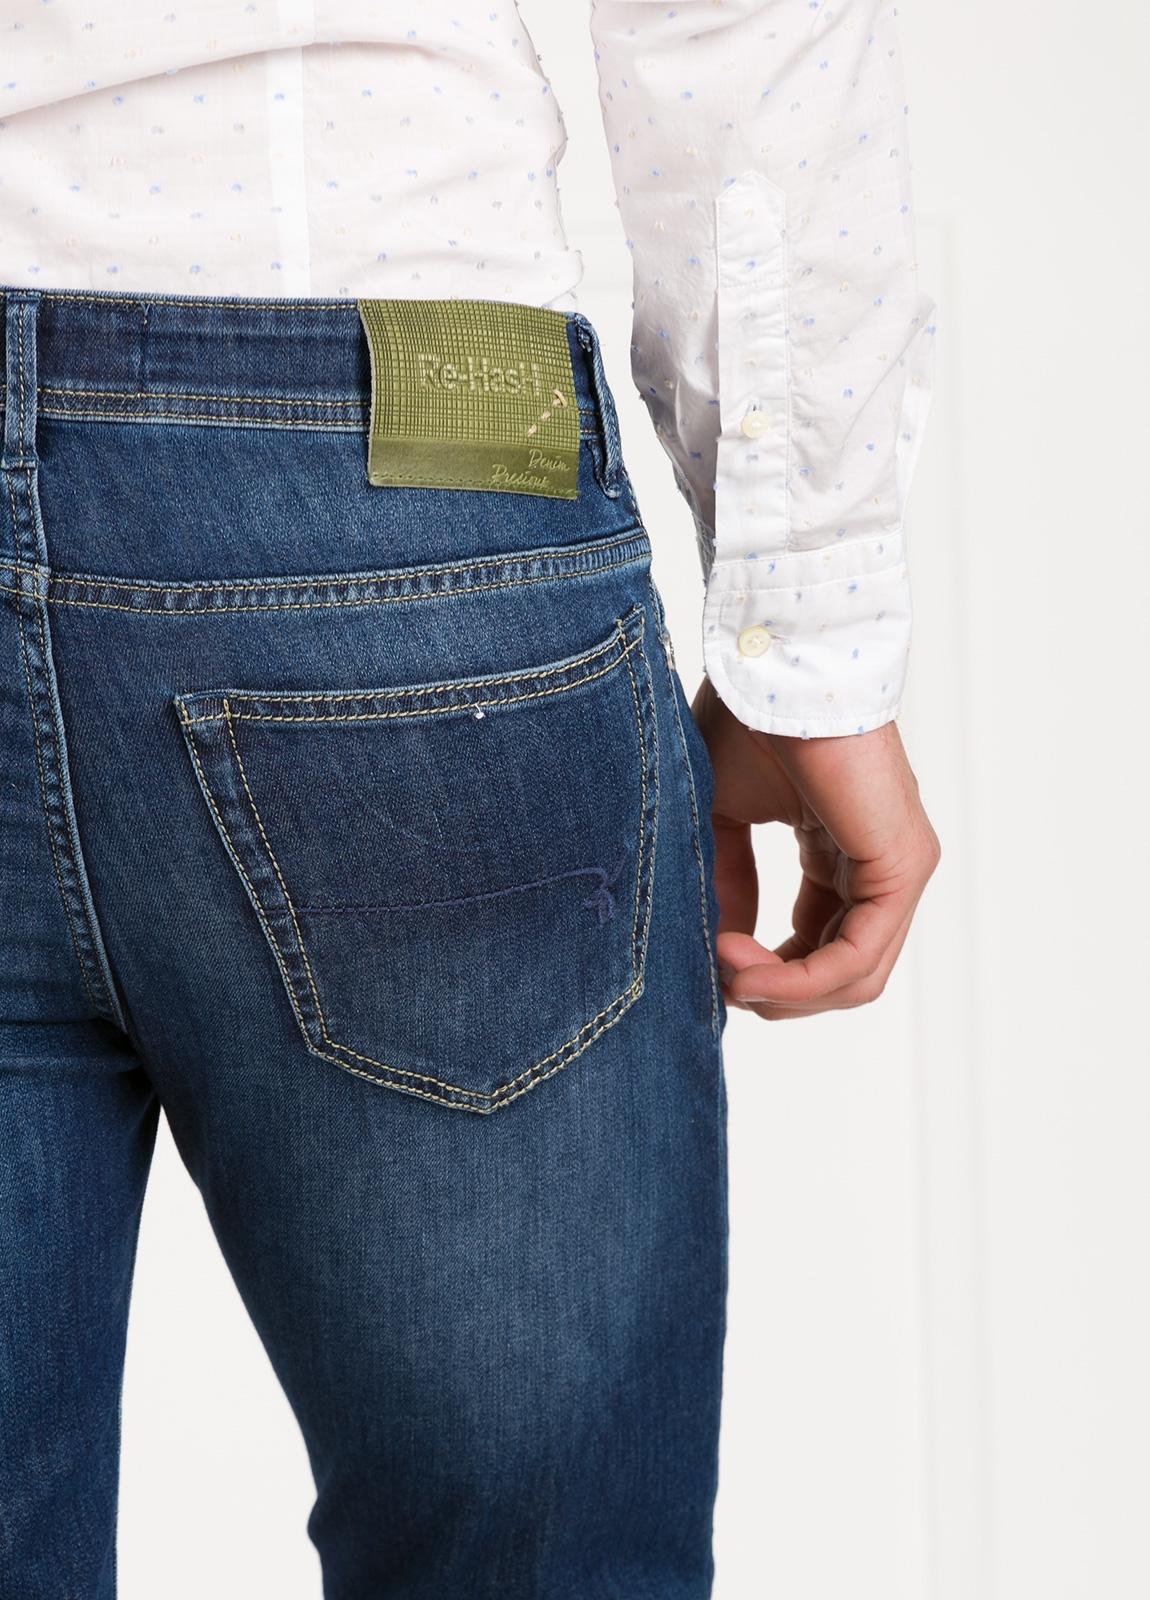 Pantalón tejano modelo POLLOCK P053 color azul. 92% Algodón, 6% Elastomultiéster, 2% Elastáno. - Ítem1